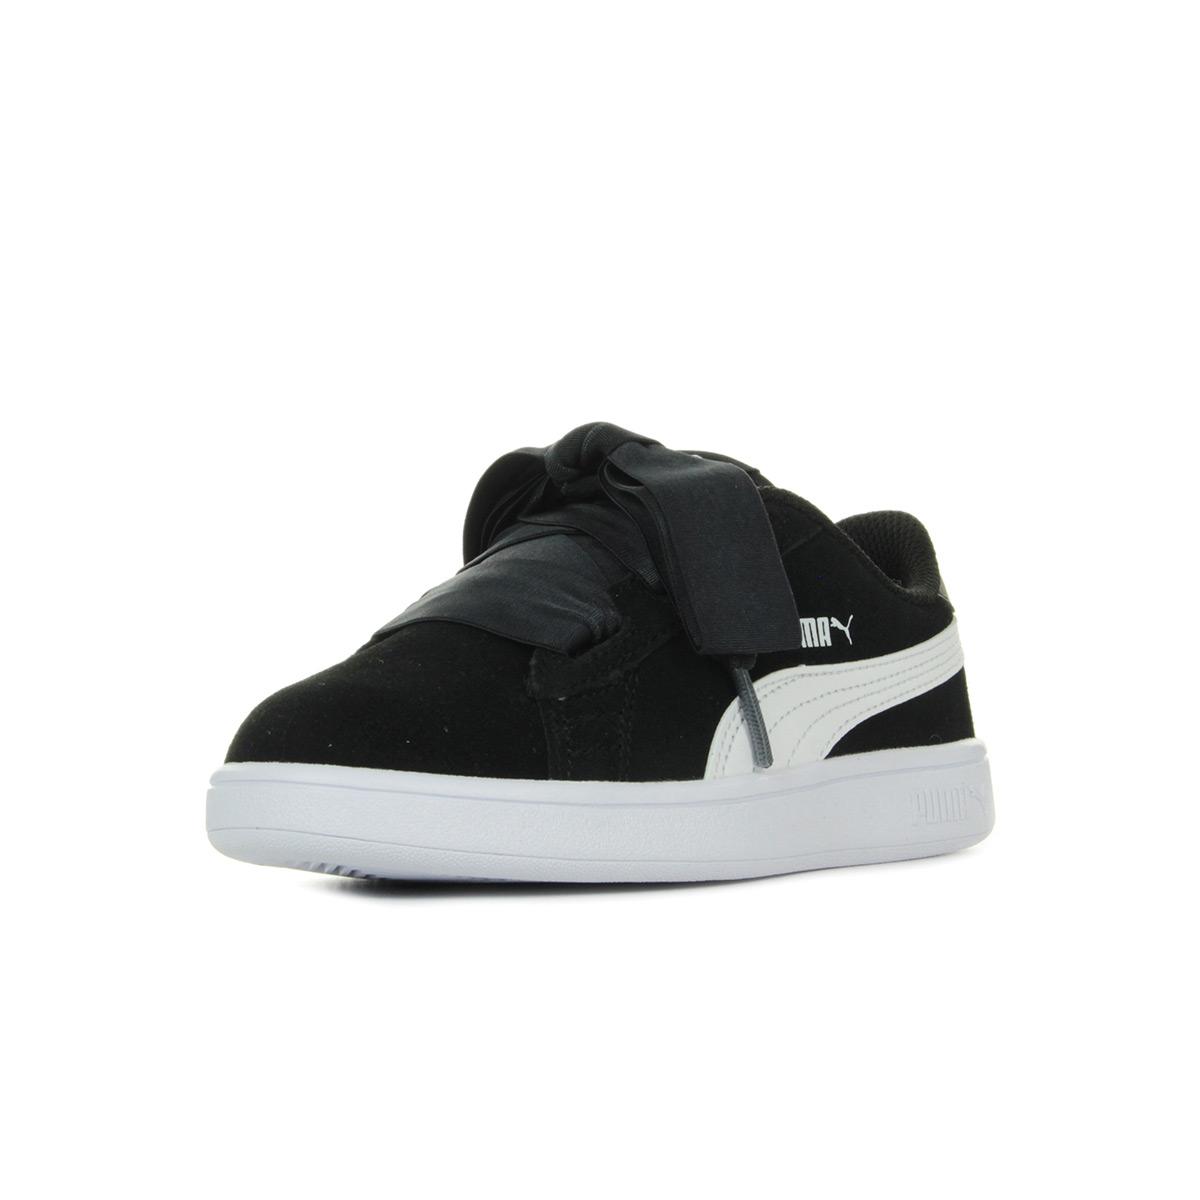 Details zu Schuhe Puma Mädchen Smash v2 Ribbon AC PS schwarz